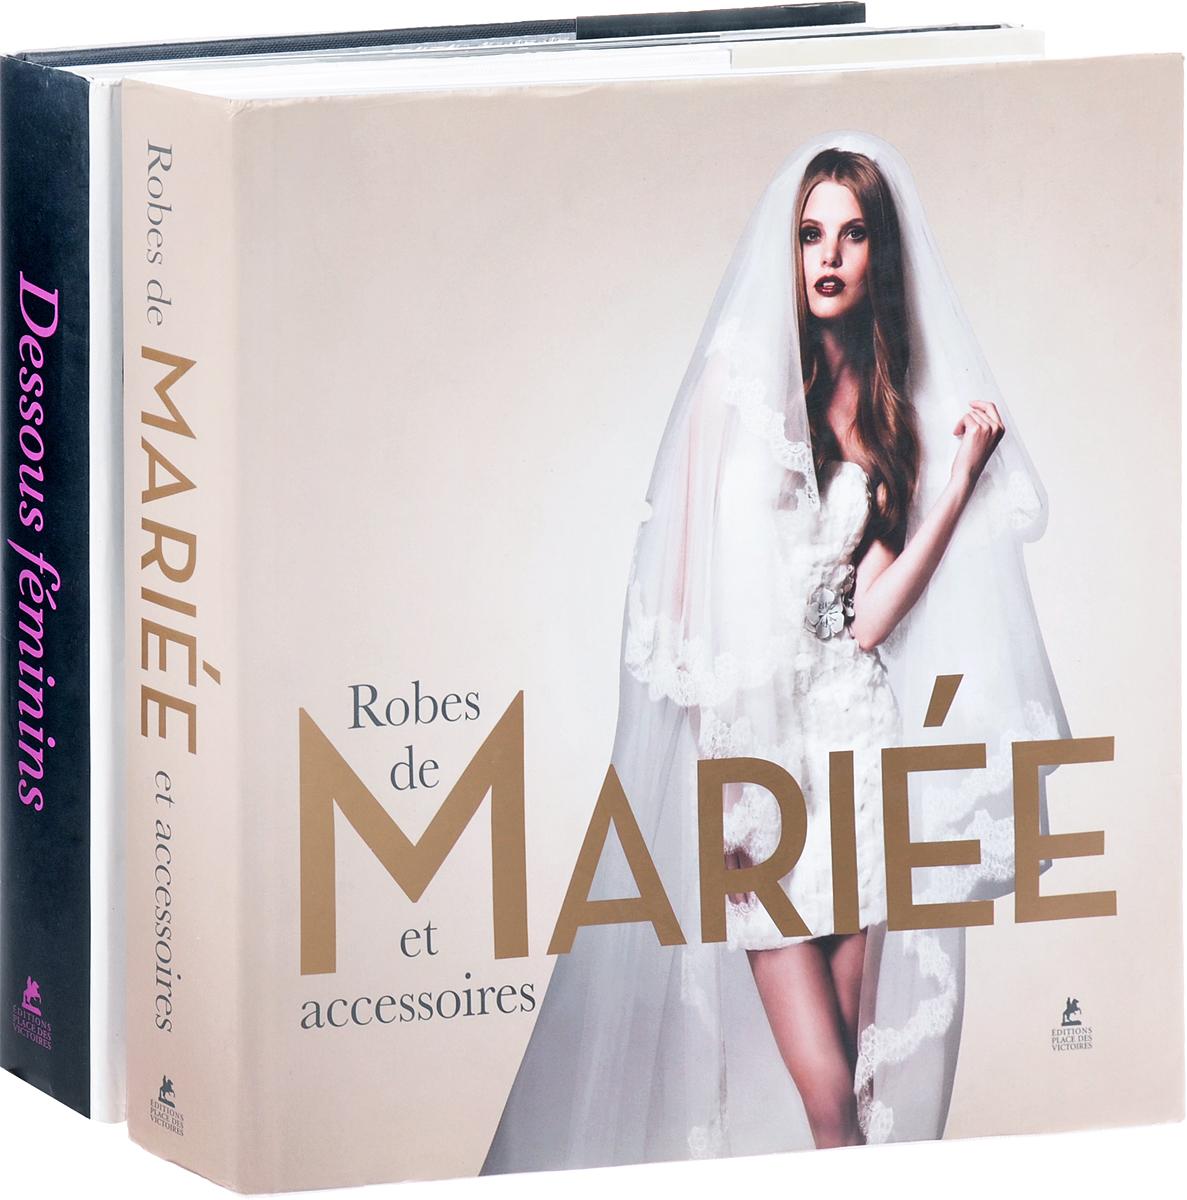 Glandien S. Robes de mariee et accessoires / Свадебные платья и аксессуары